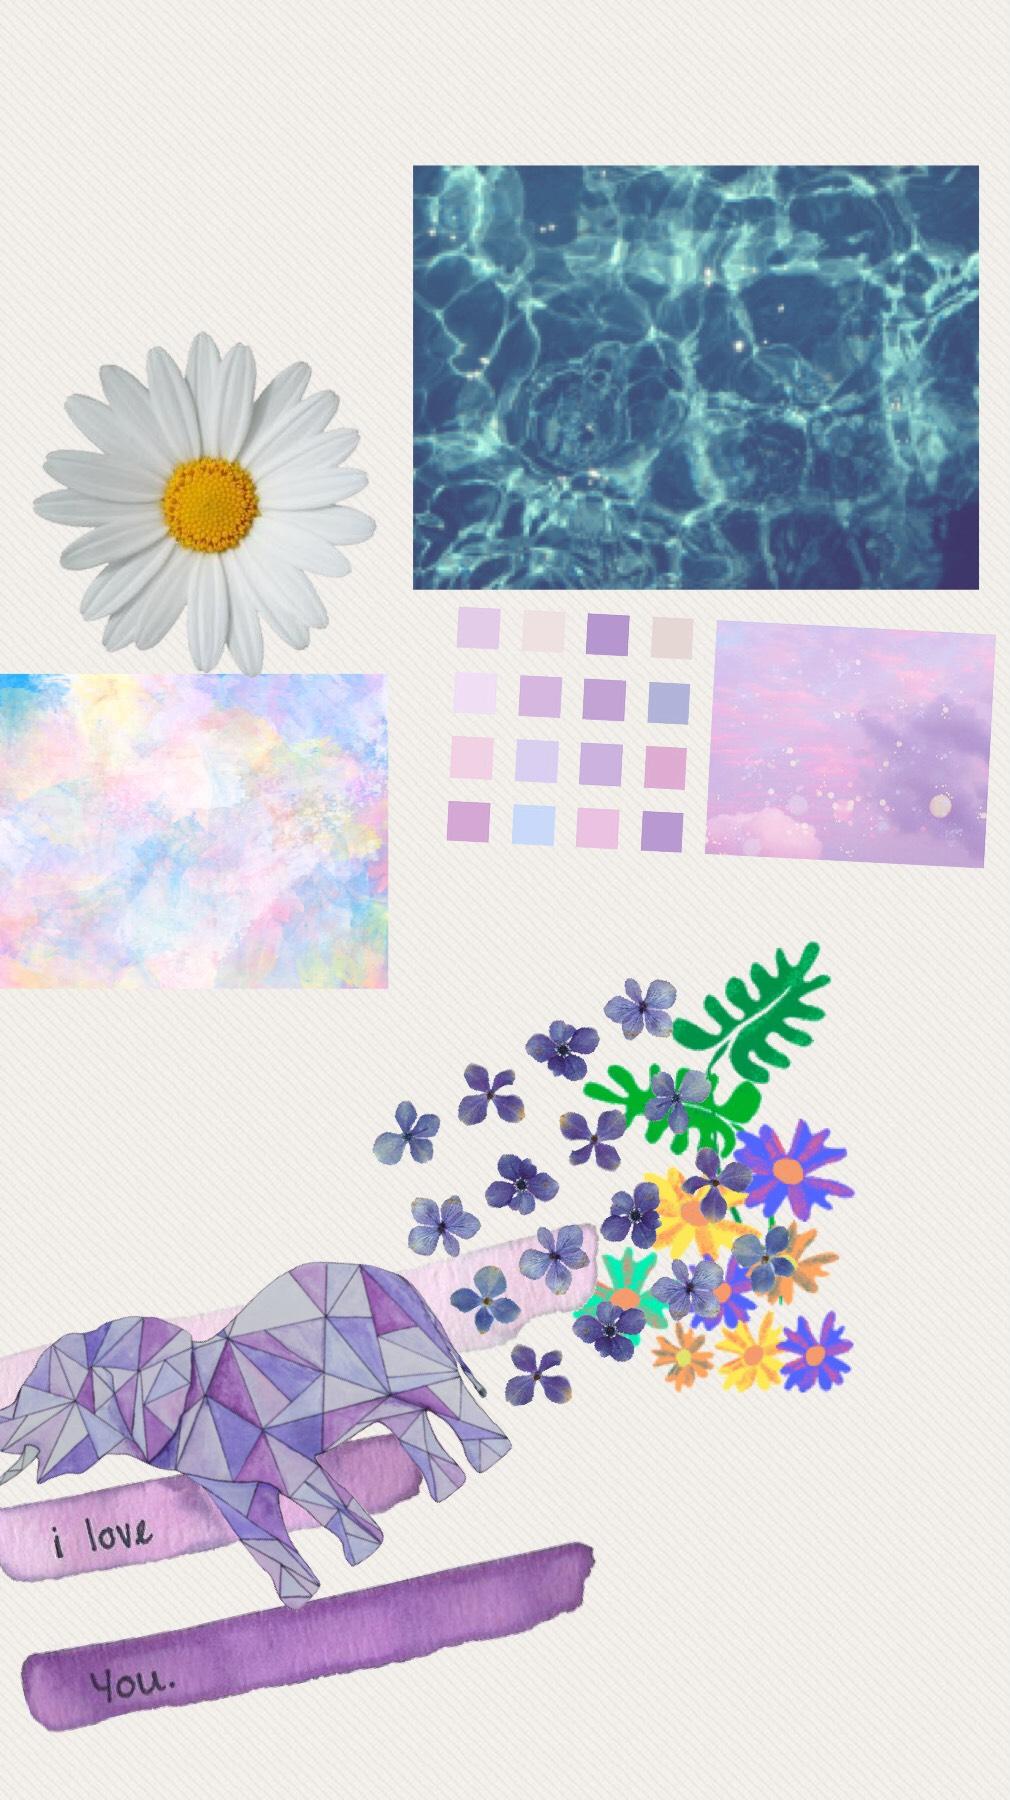 Collage by jojobear